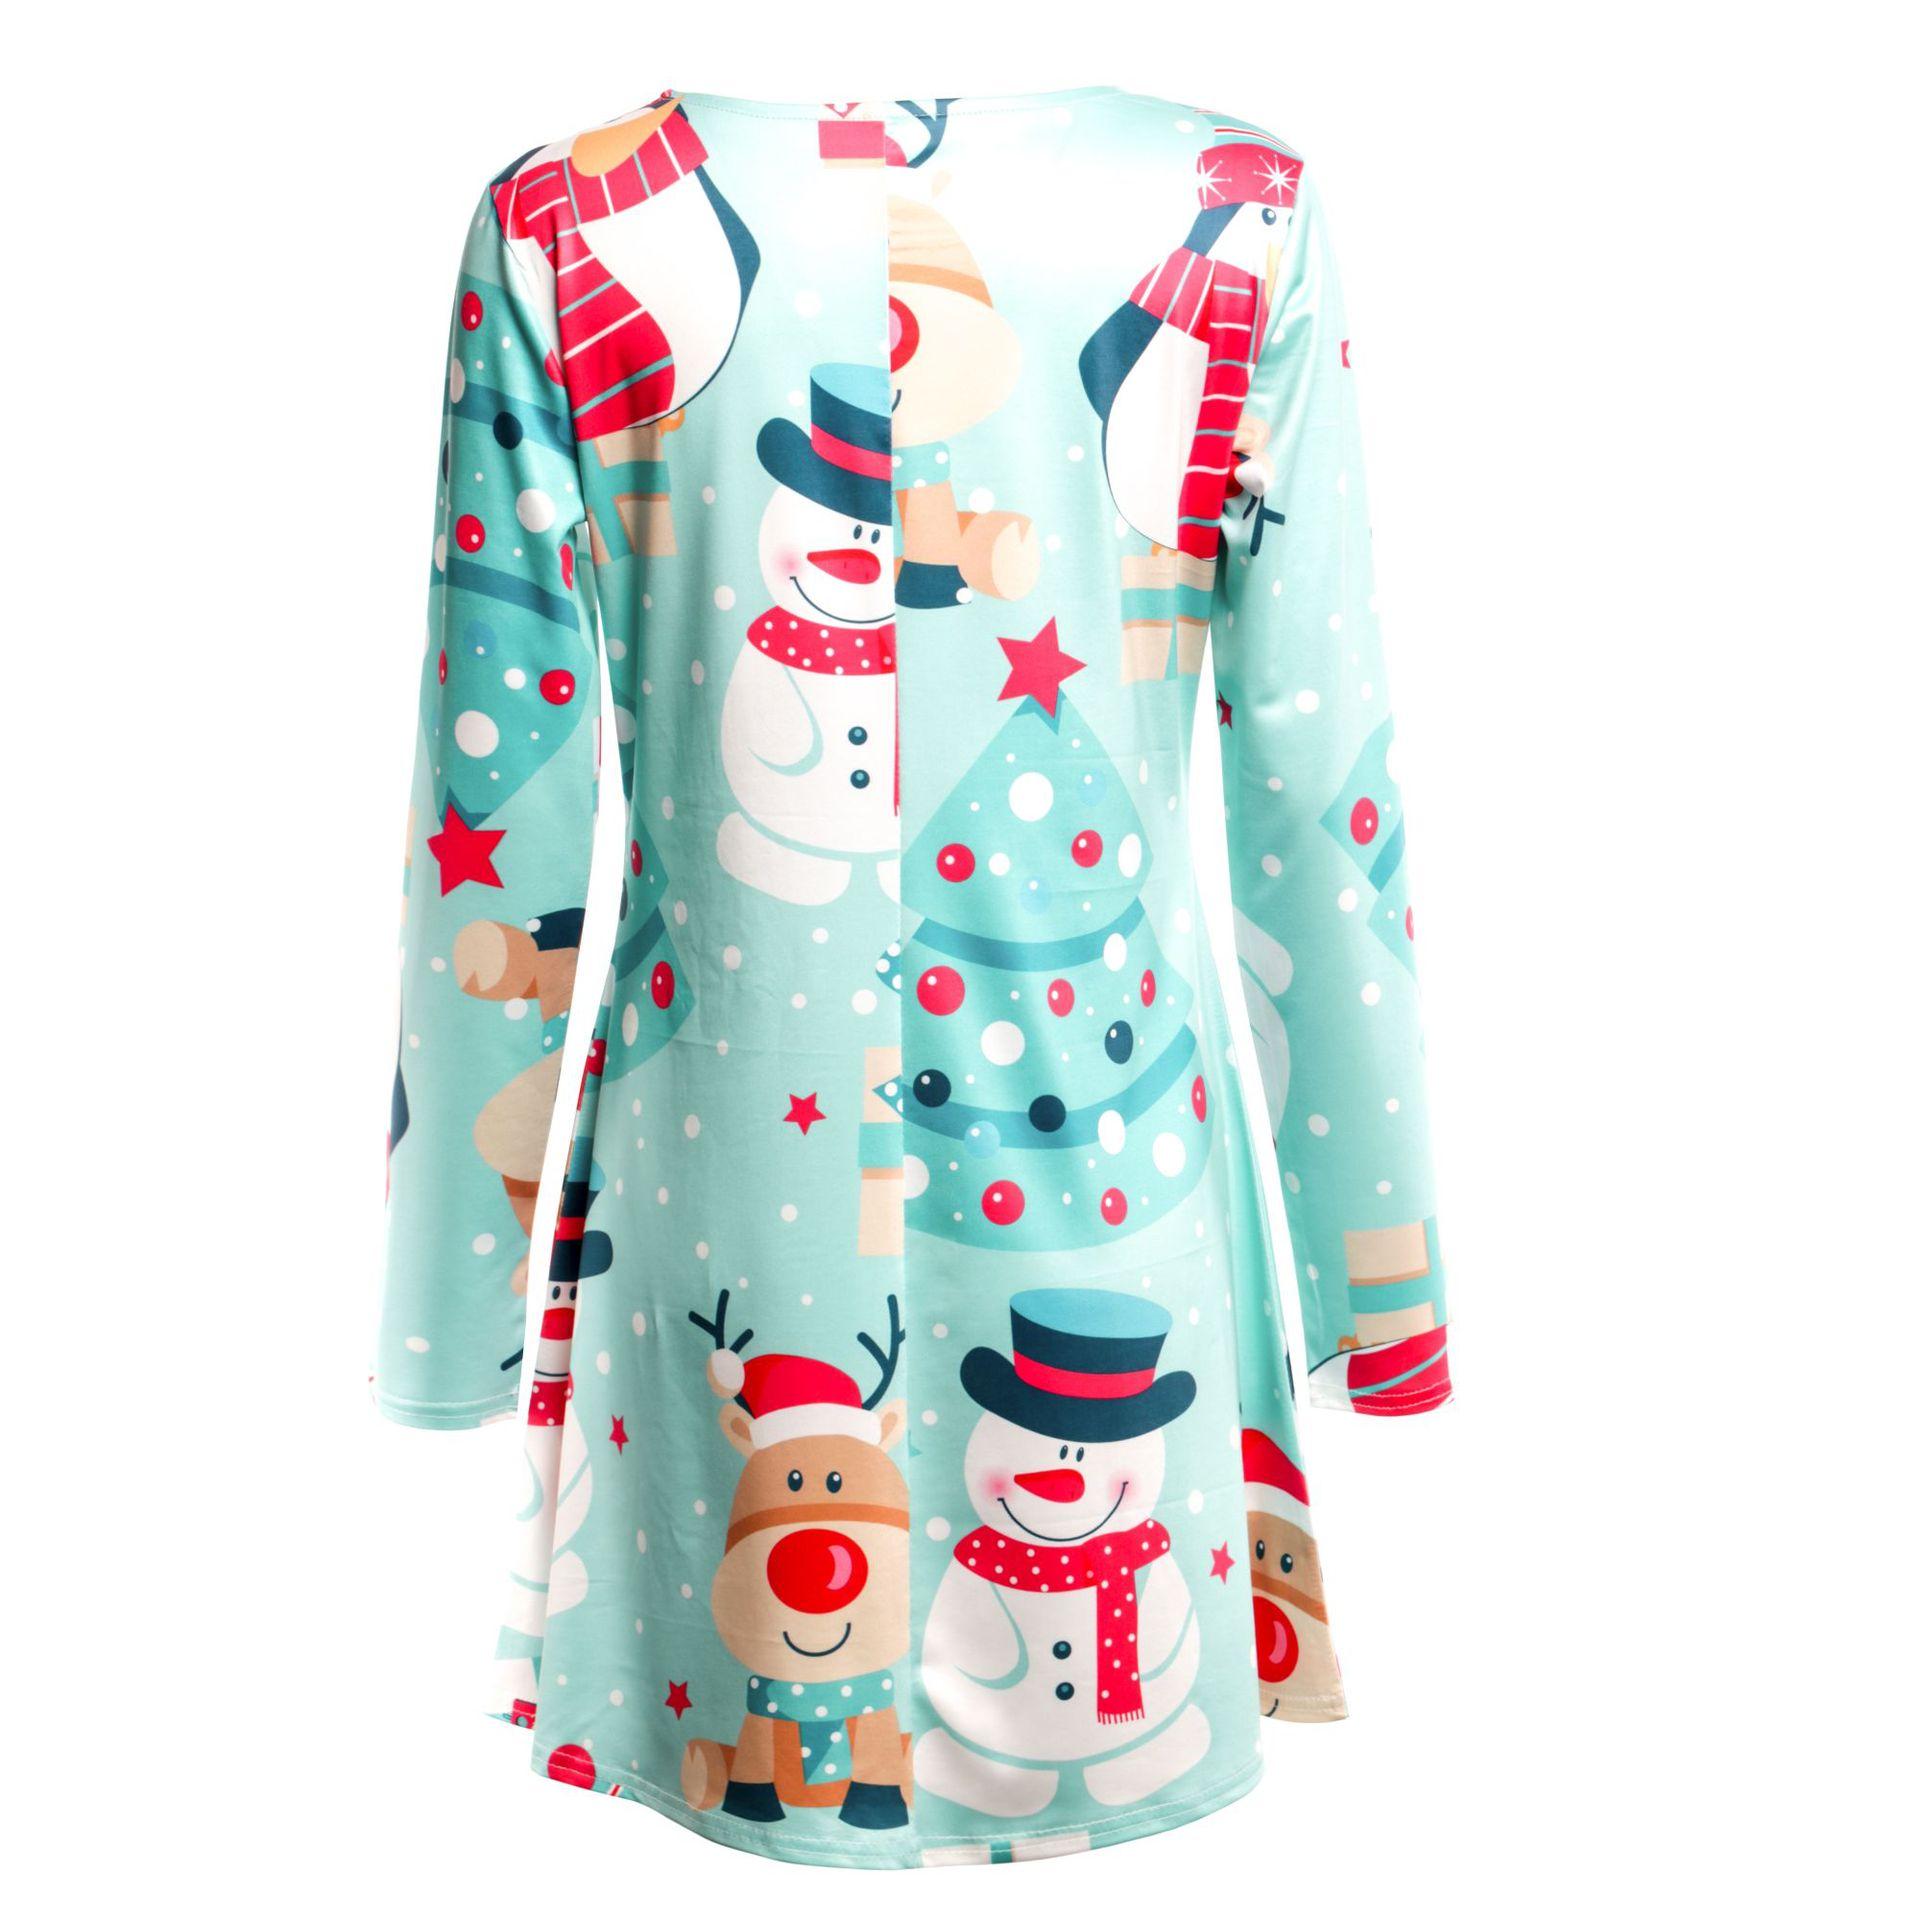 Print Long Sleeve Autumn Winter Christmas Dress Women 19 Casual Loose Short Party Dress Plus Size S-5XL Vestidos 16